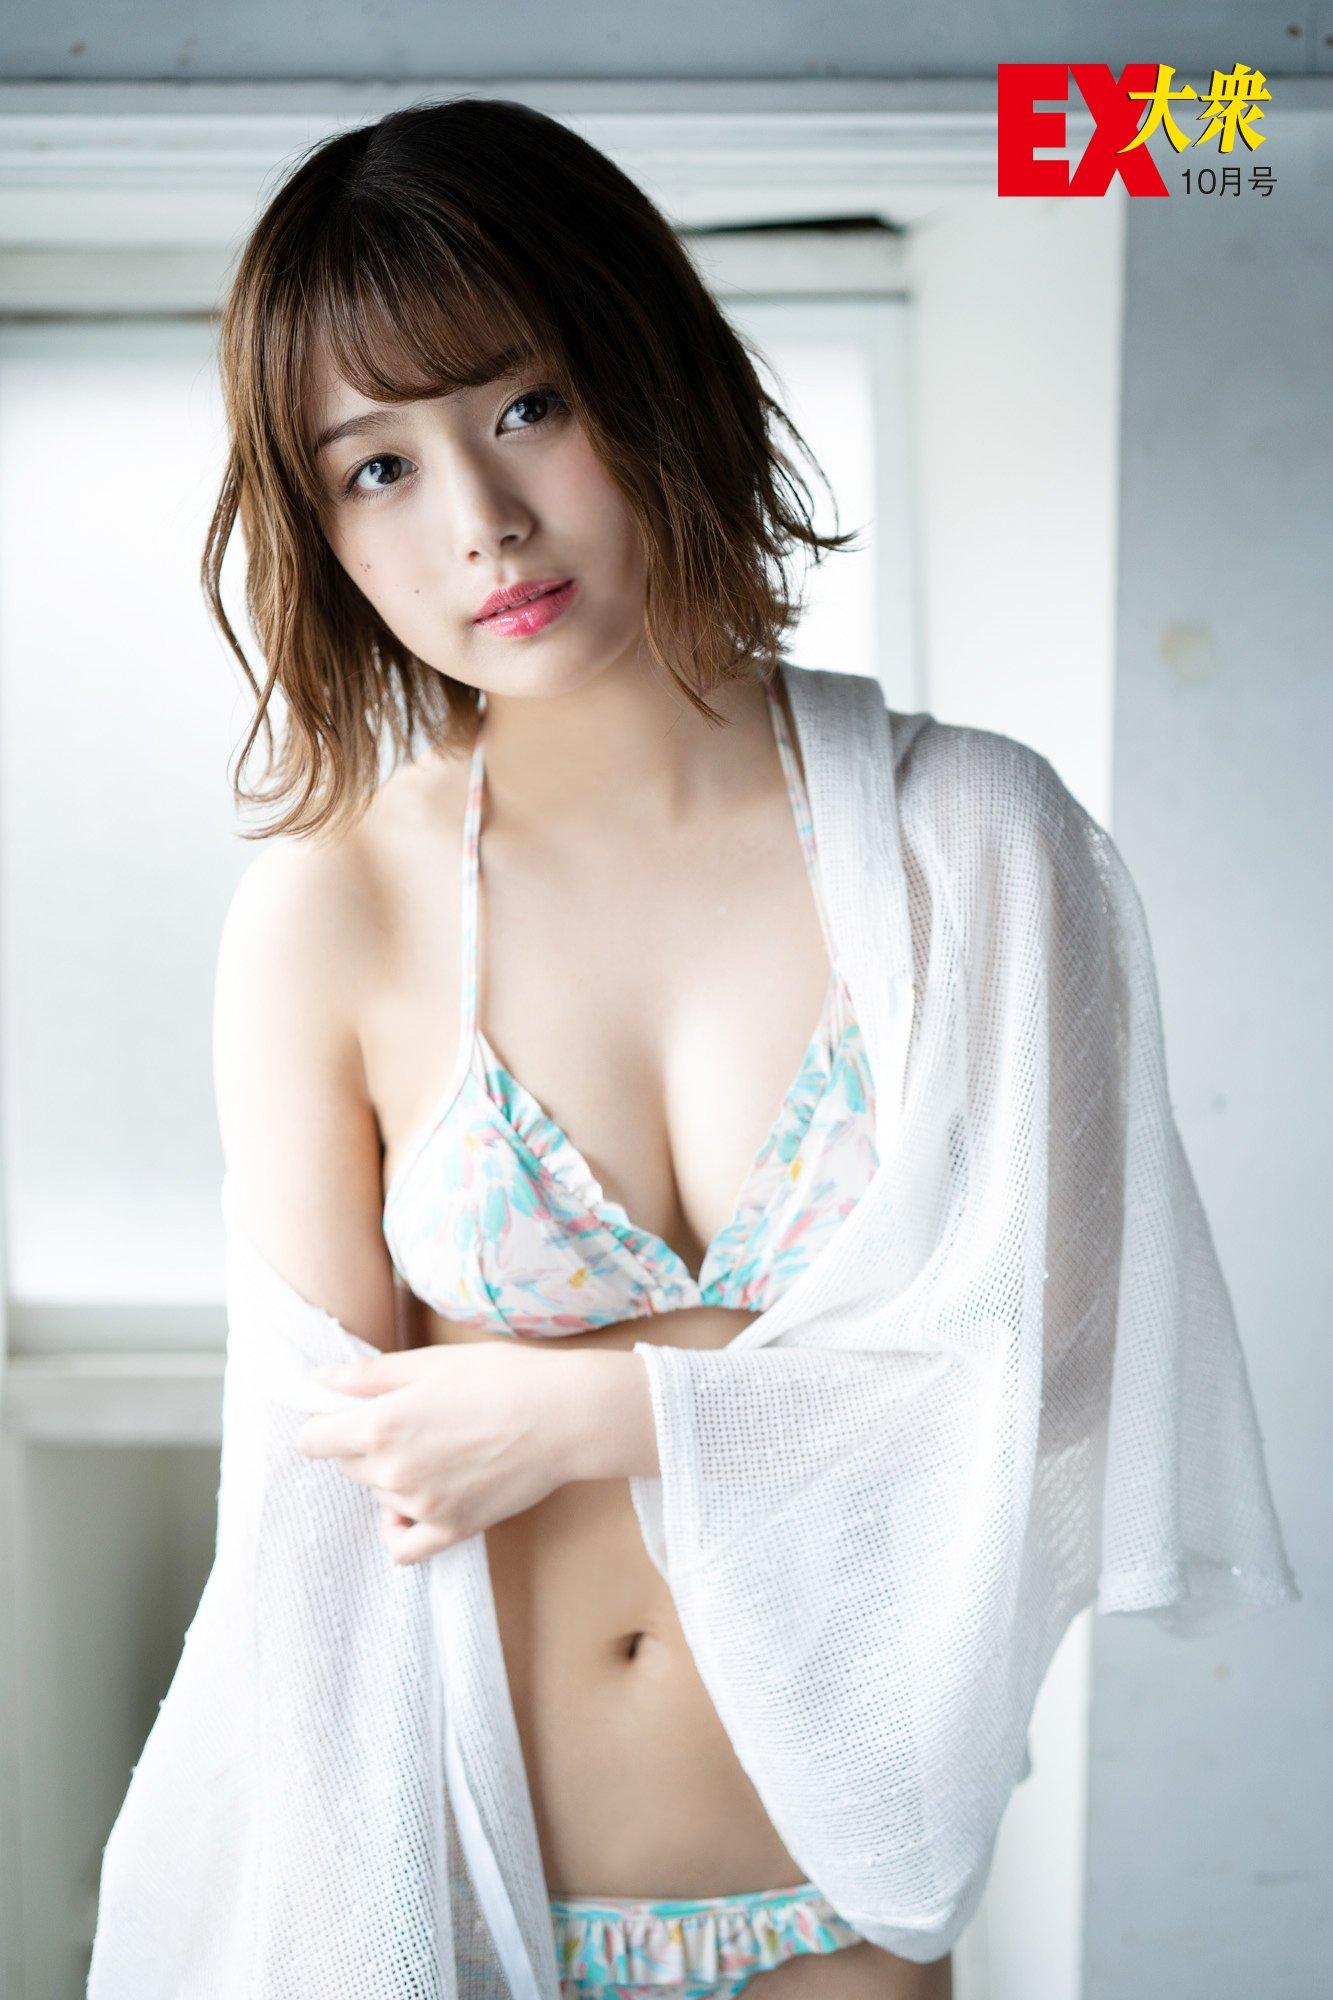 SKE48北野瑠華の本誌未掲載カット6枚を大公開!【EX大衆10月号】の画像001